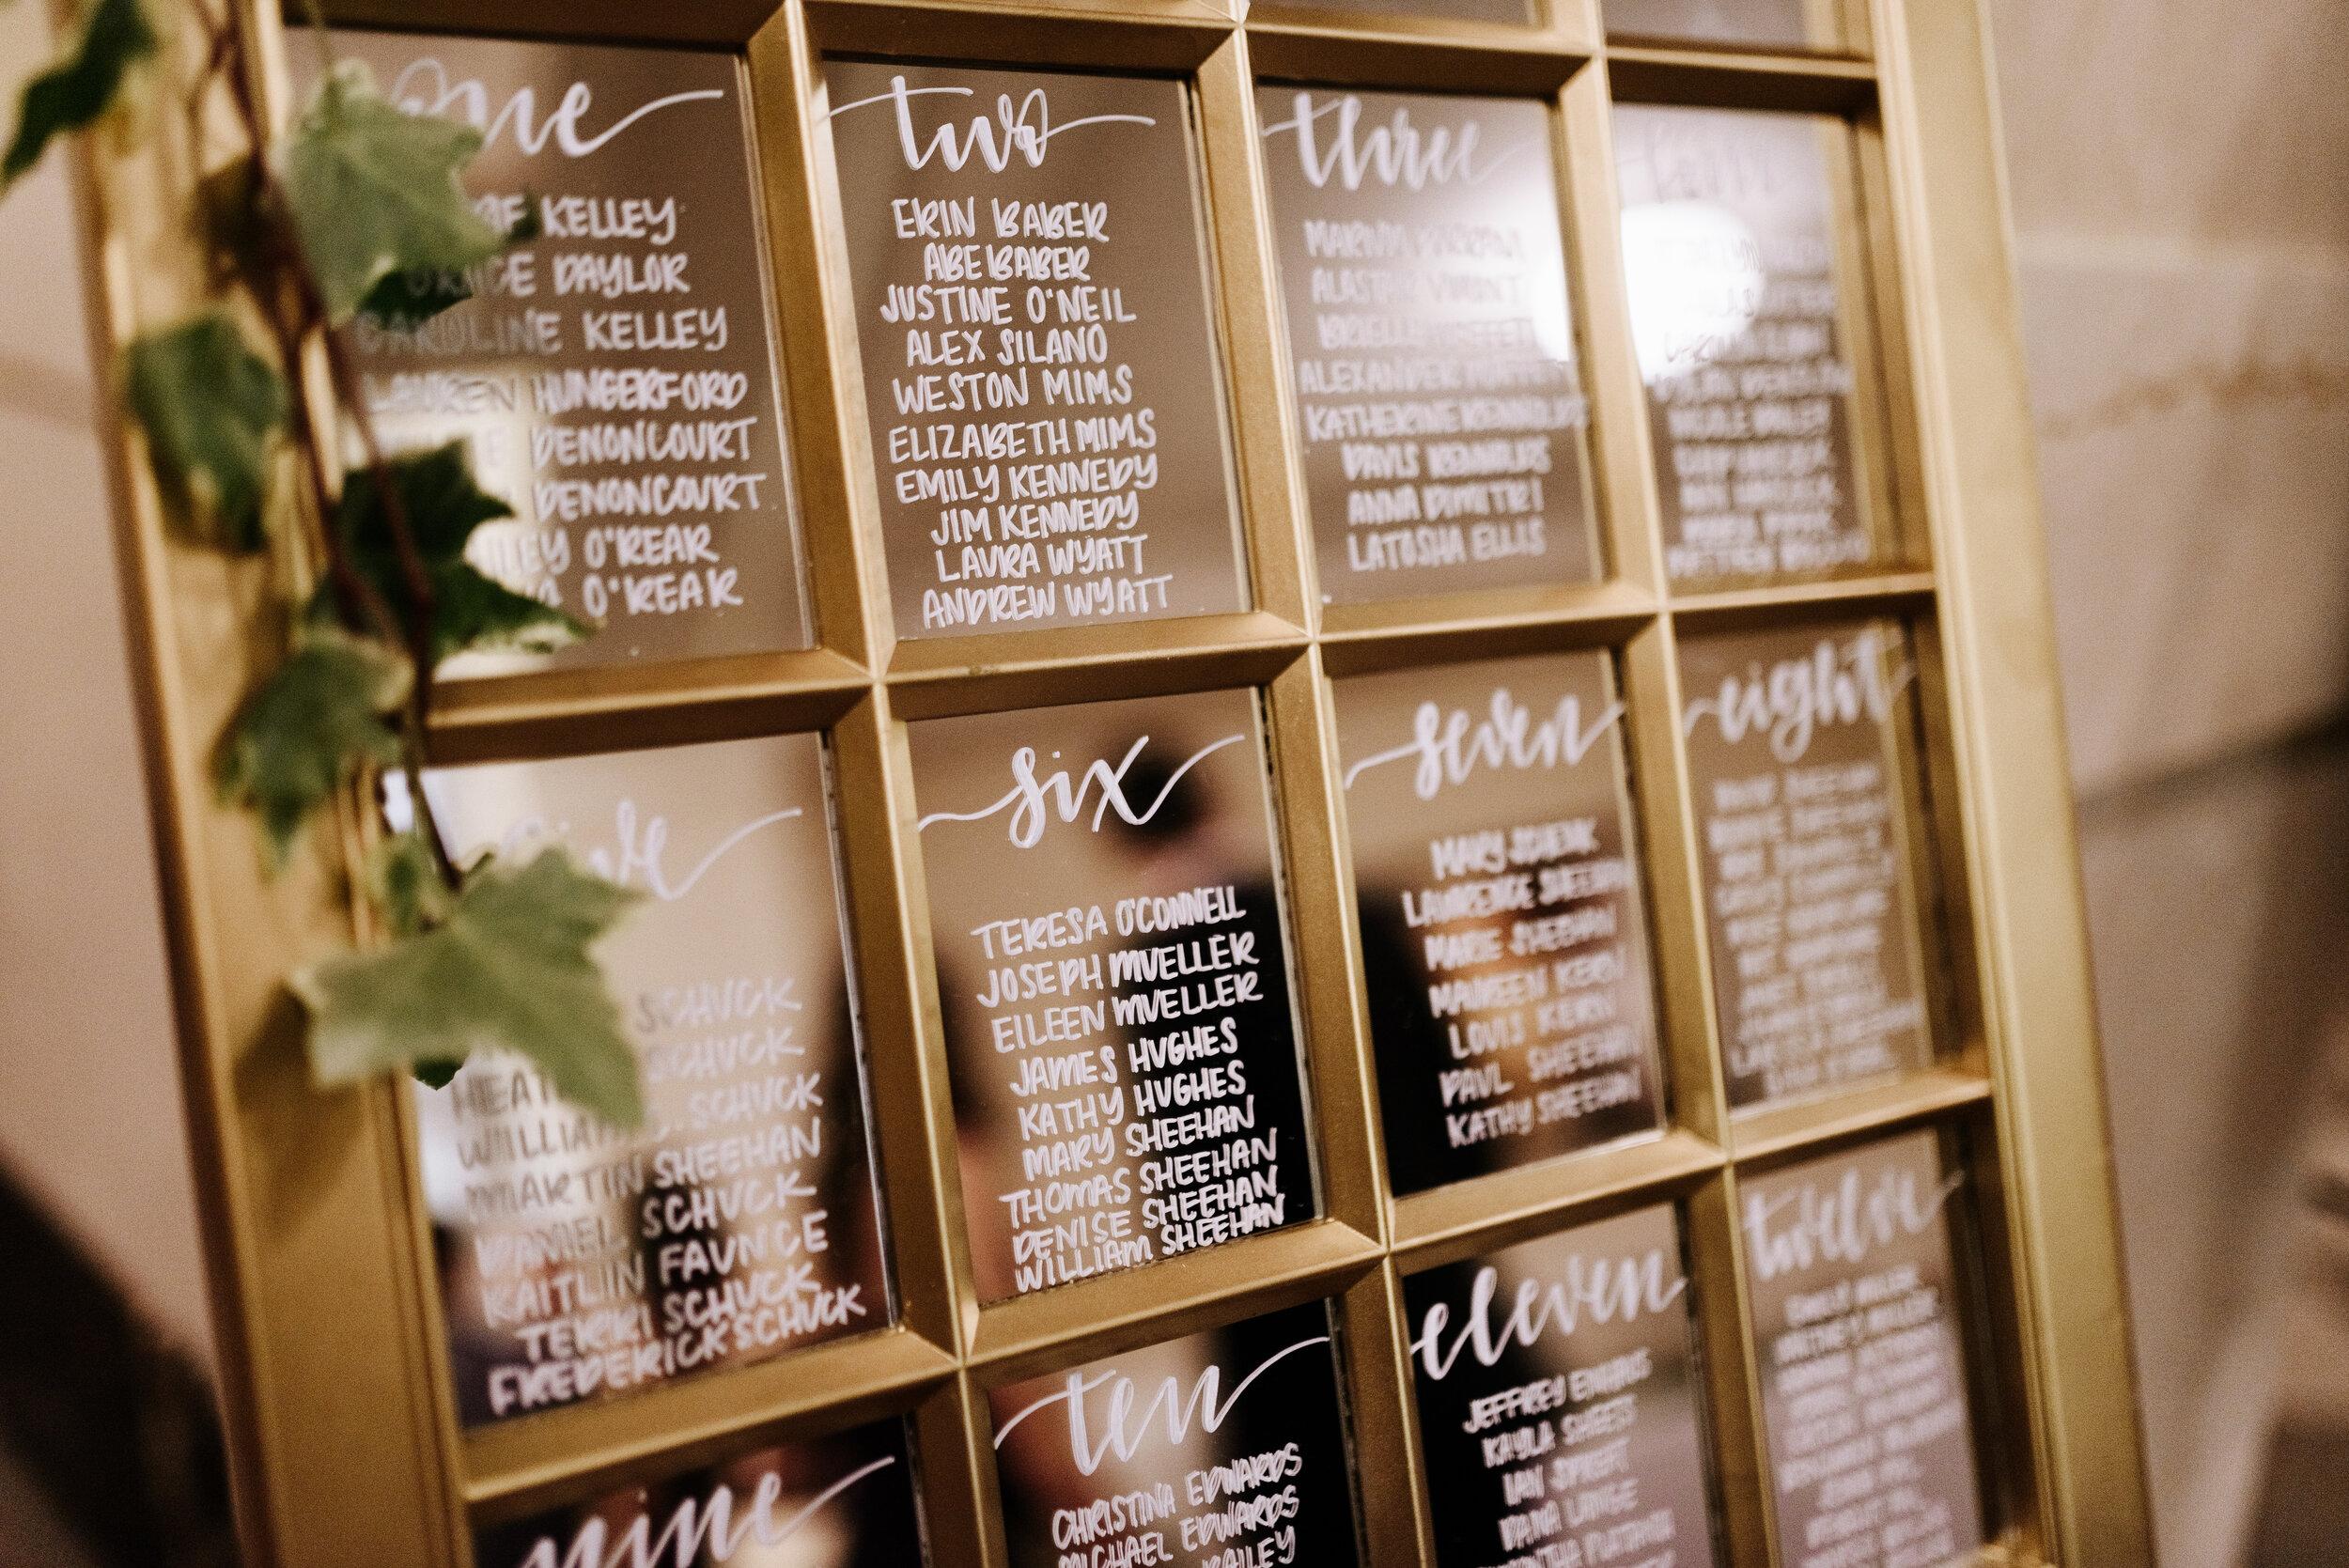 Cassie-Mrunal-Wedding-Quirk-Hotel-John-Marshall-Ballrooms-Richmond-Virginia-Photography-by-V-83.jpg